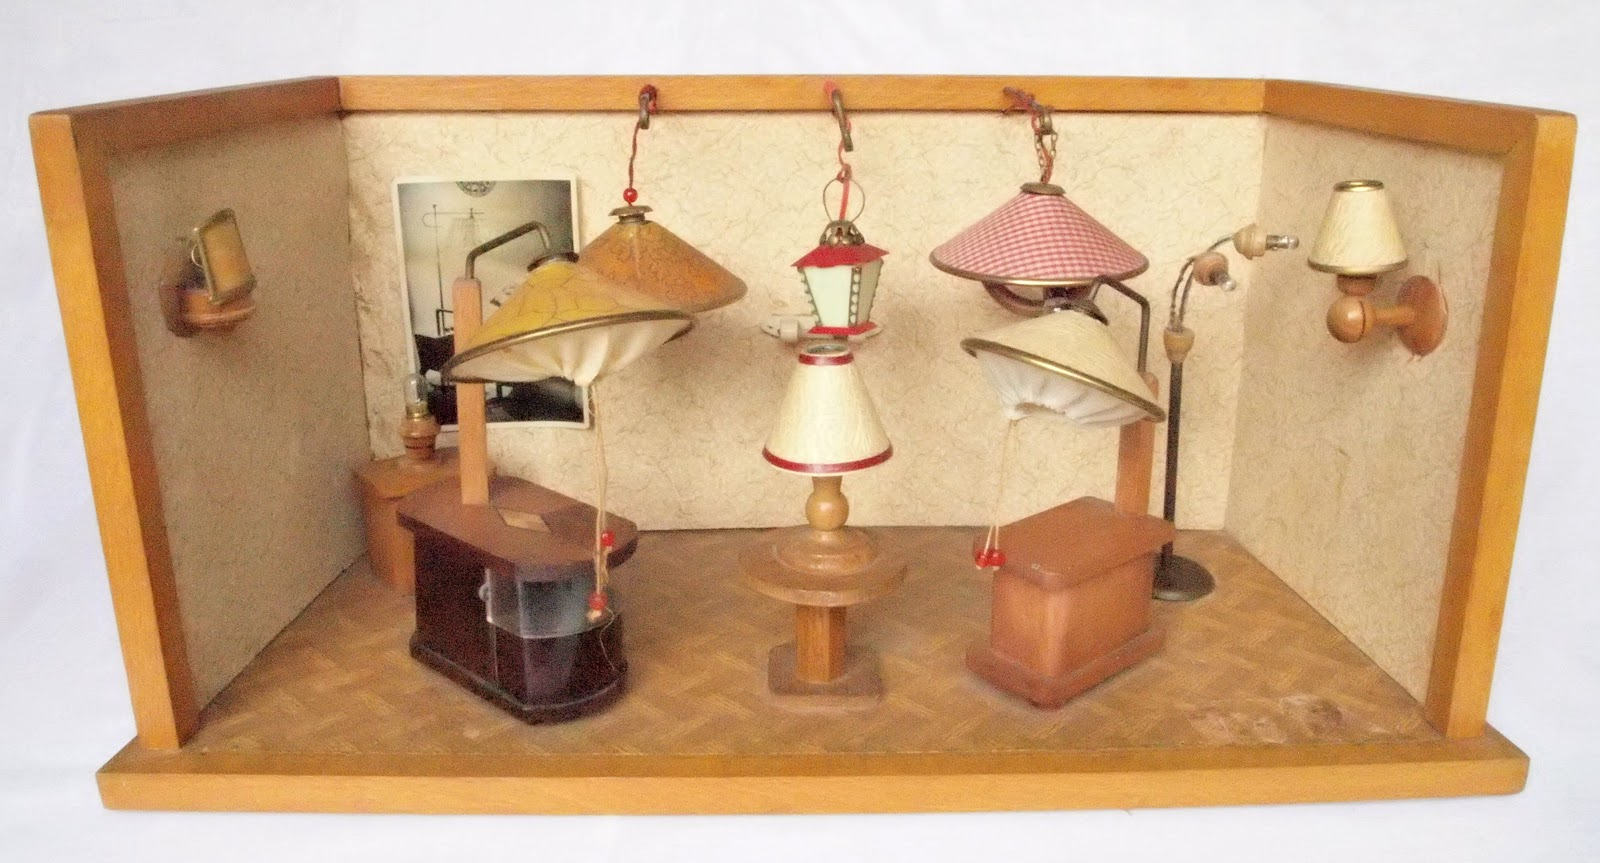 Diepuppenstubensammlerin lampenladen frank und kahlert for Lampen laden